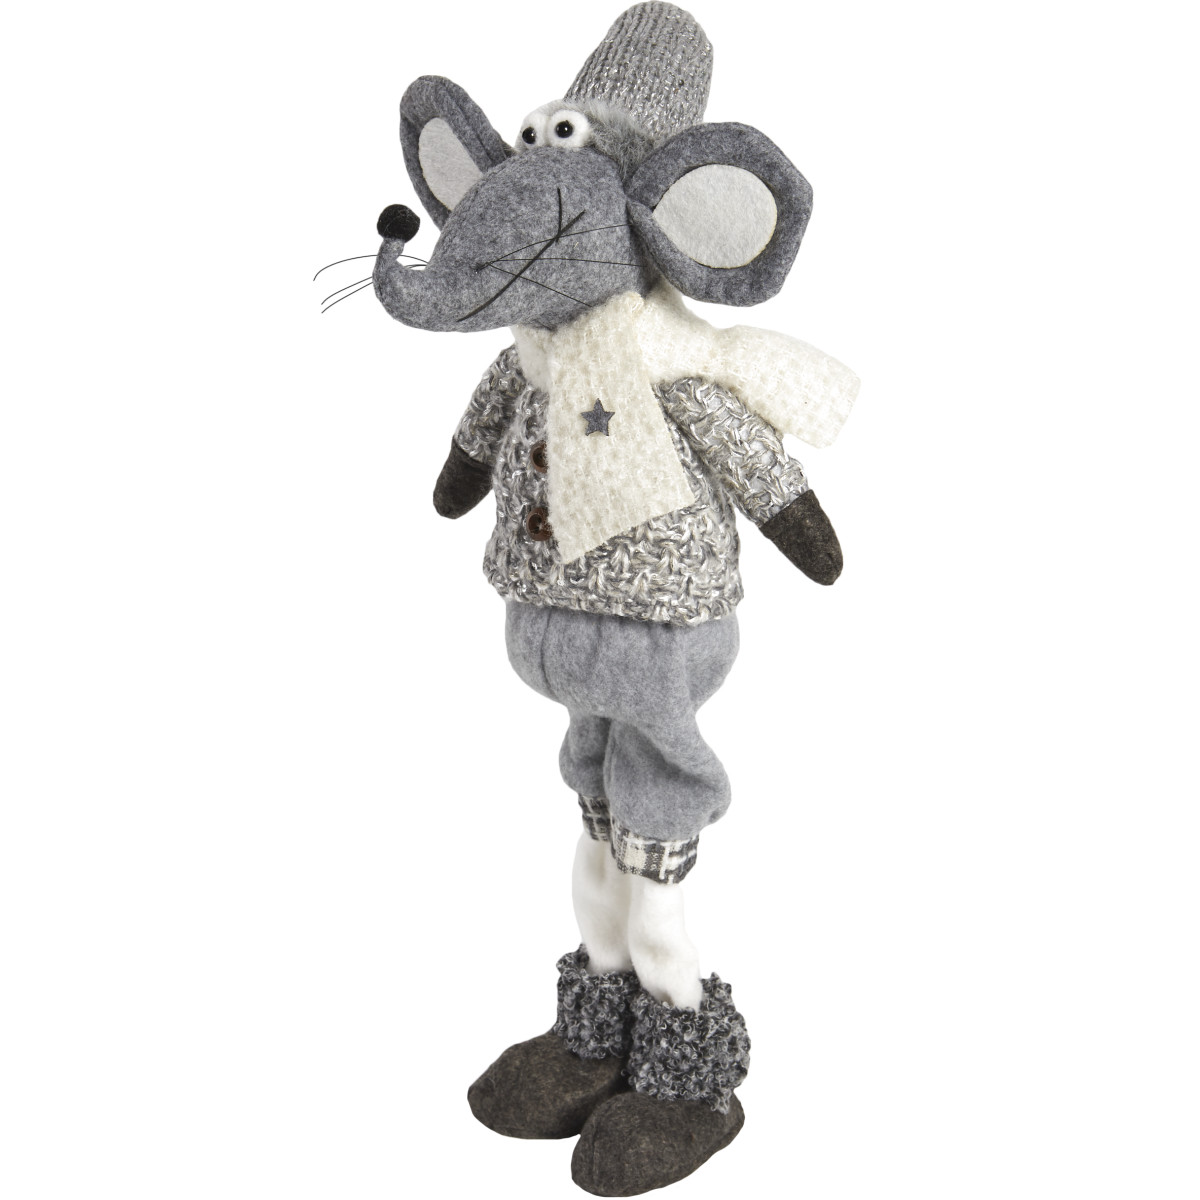 Мягкая Игрушка Мышонок Серый 54